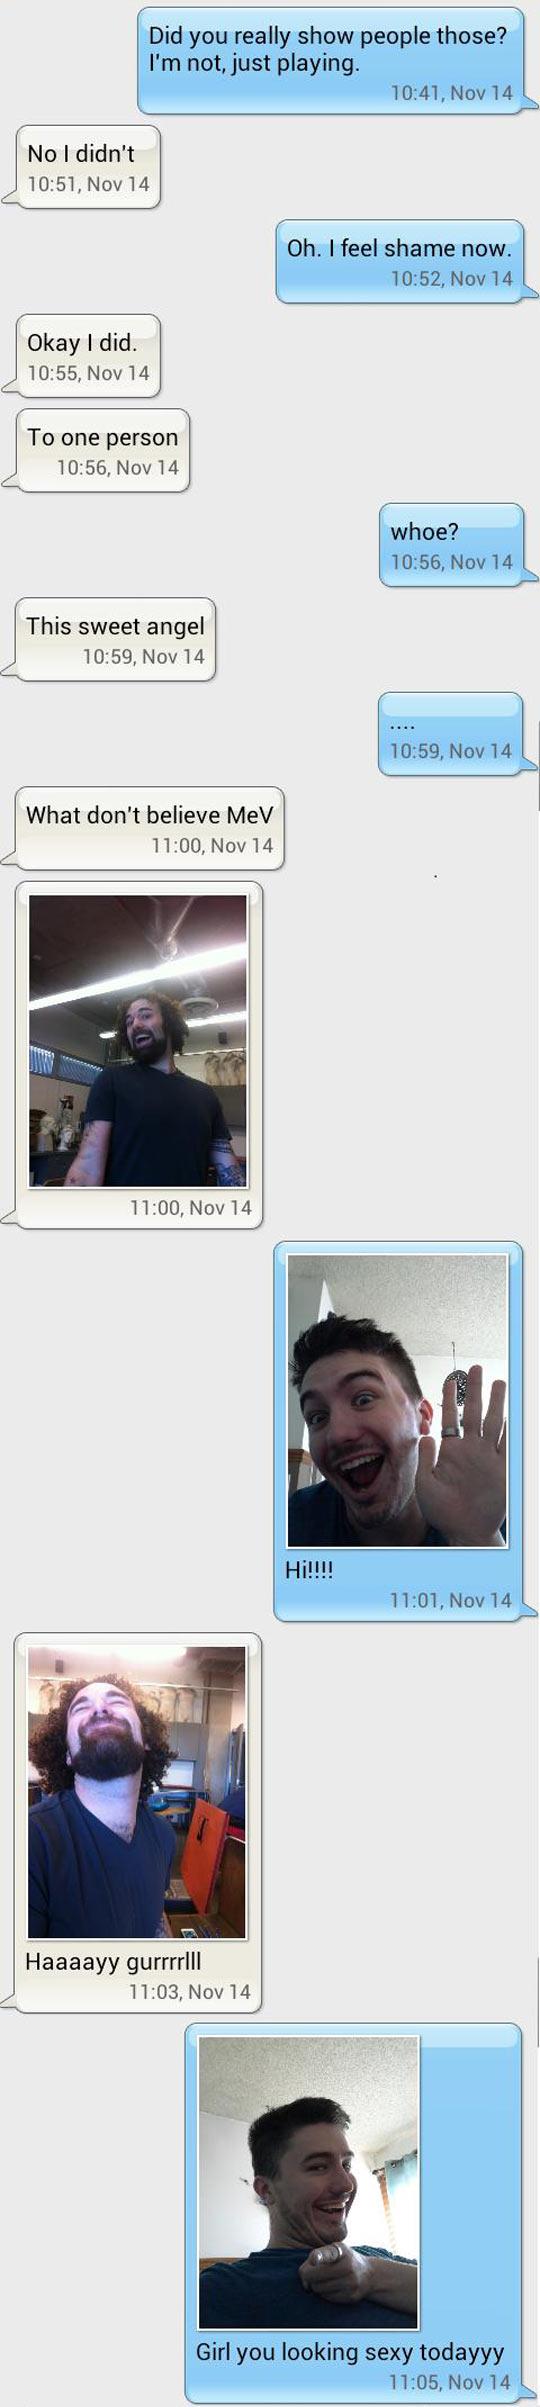 funny-phone-photo-smile-faces-stranger